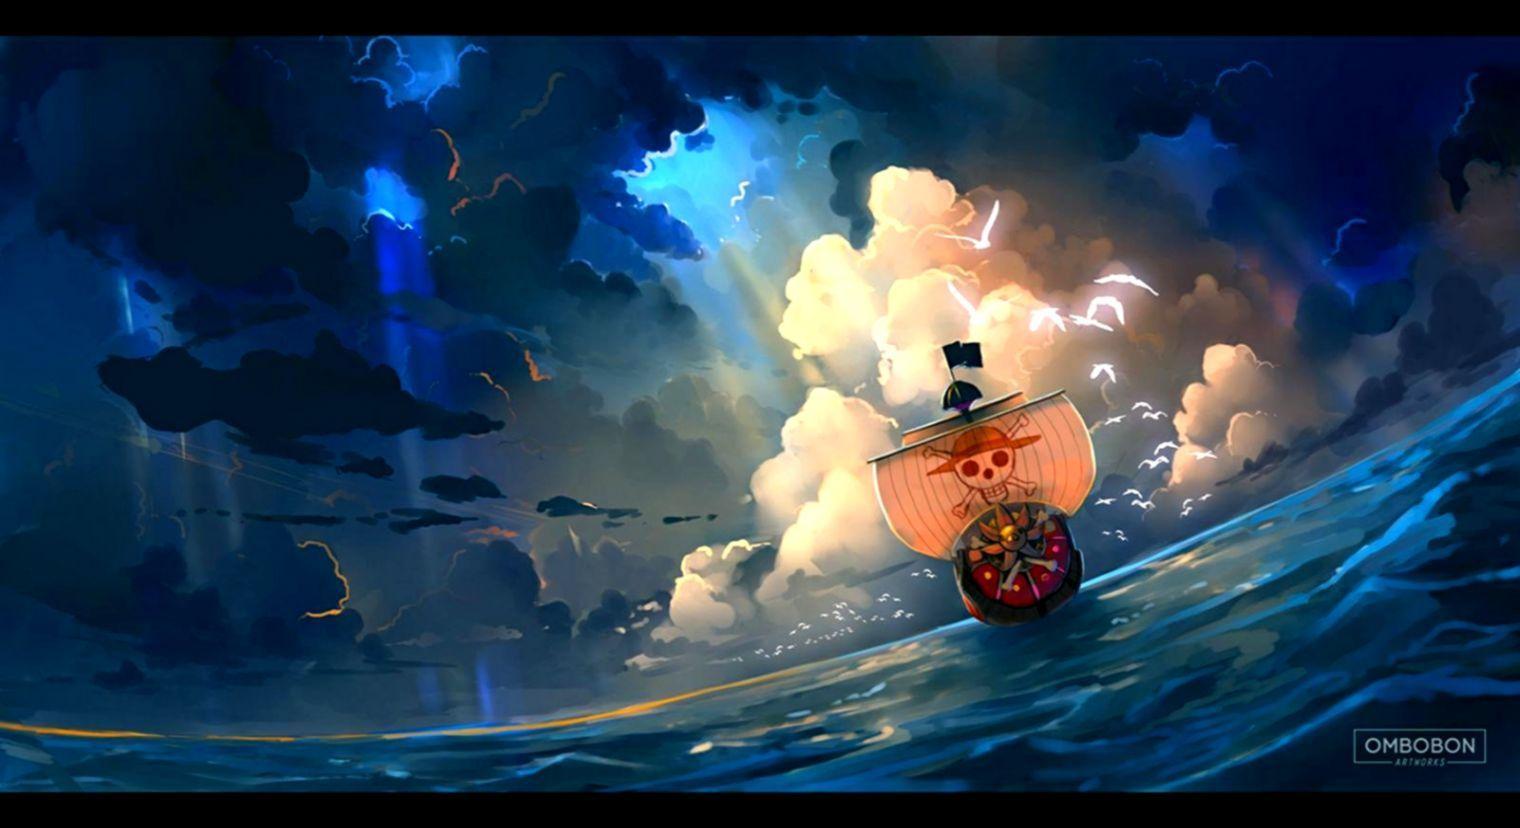 Wallpaper Anime 1920x1080 Wallpaper Anime Anime Wallpaper 1920x1080 Anime Wallpaper One Piece Anime